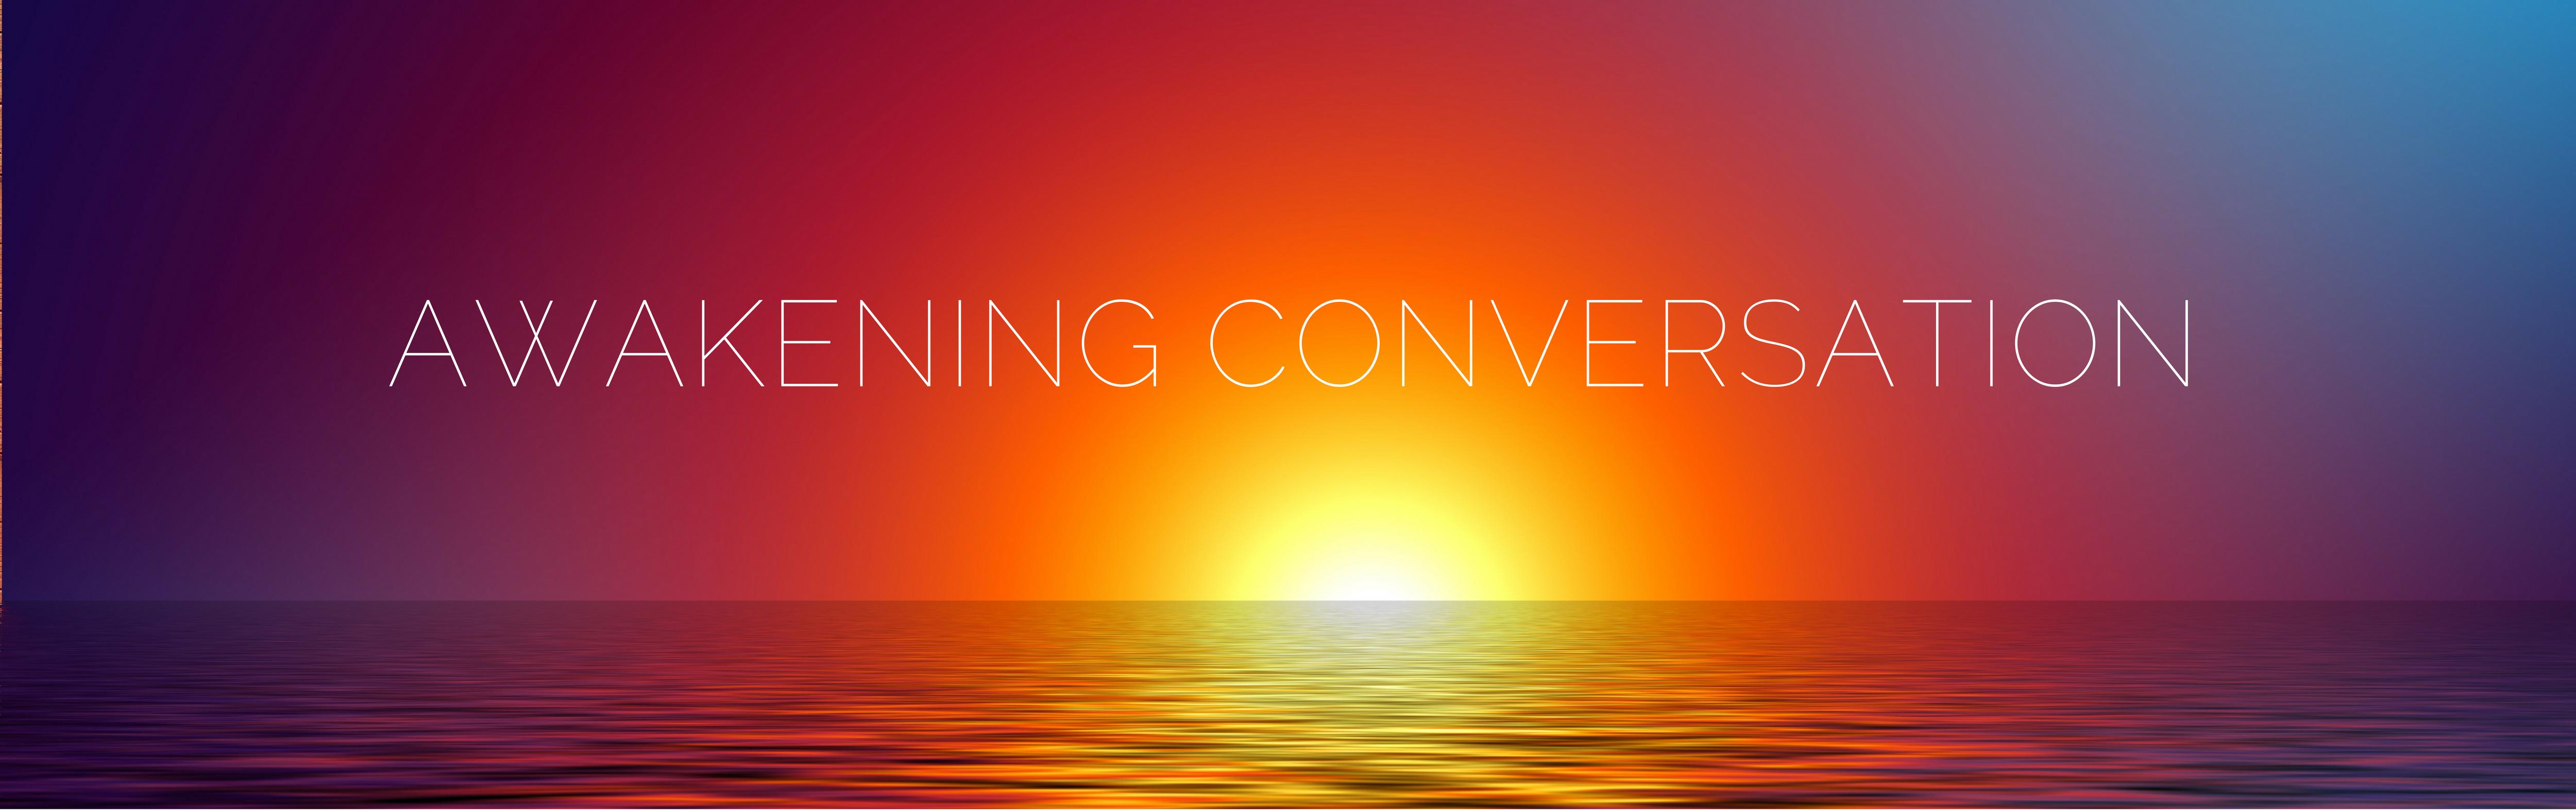 Awakening Conversation